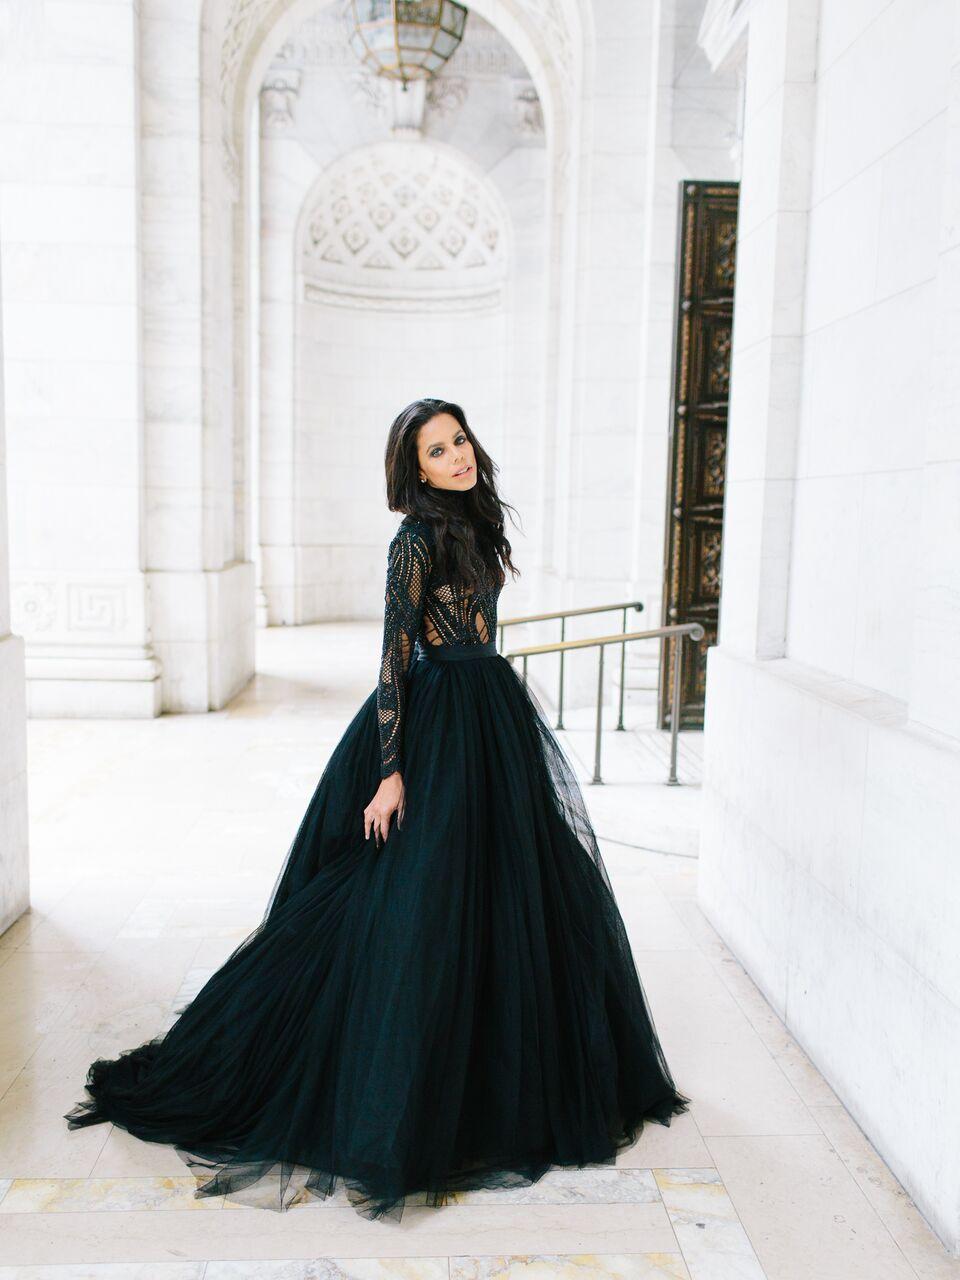 Black - NYC Fashion Silvana Tedesco Kylee Yee-32.jpg